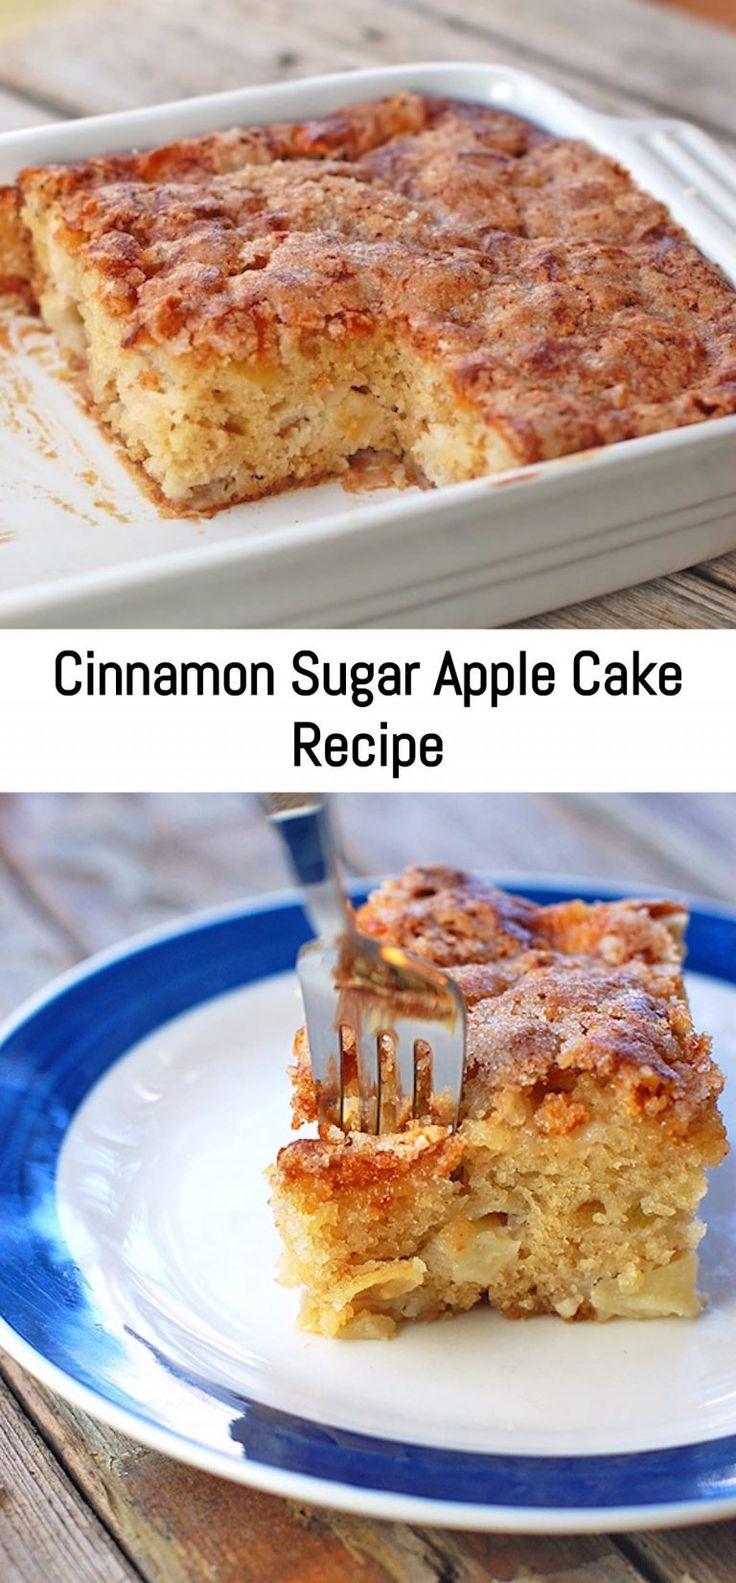 Cinnamon sugar apple cake recipe sanji recipe apple